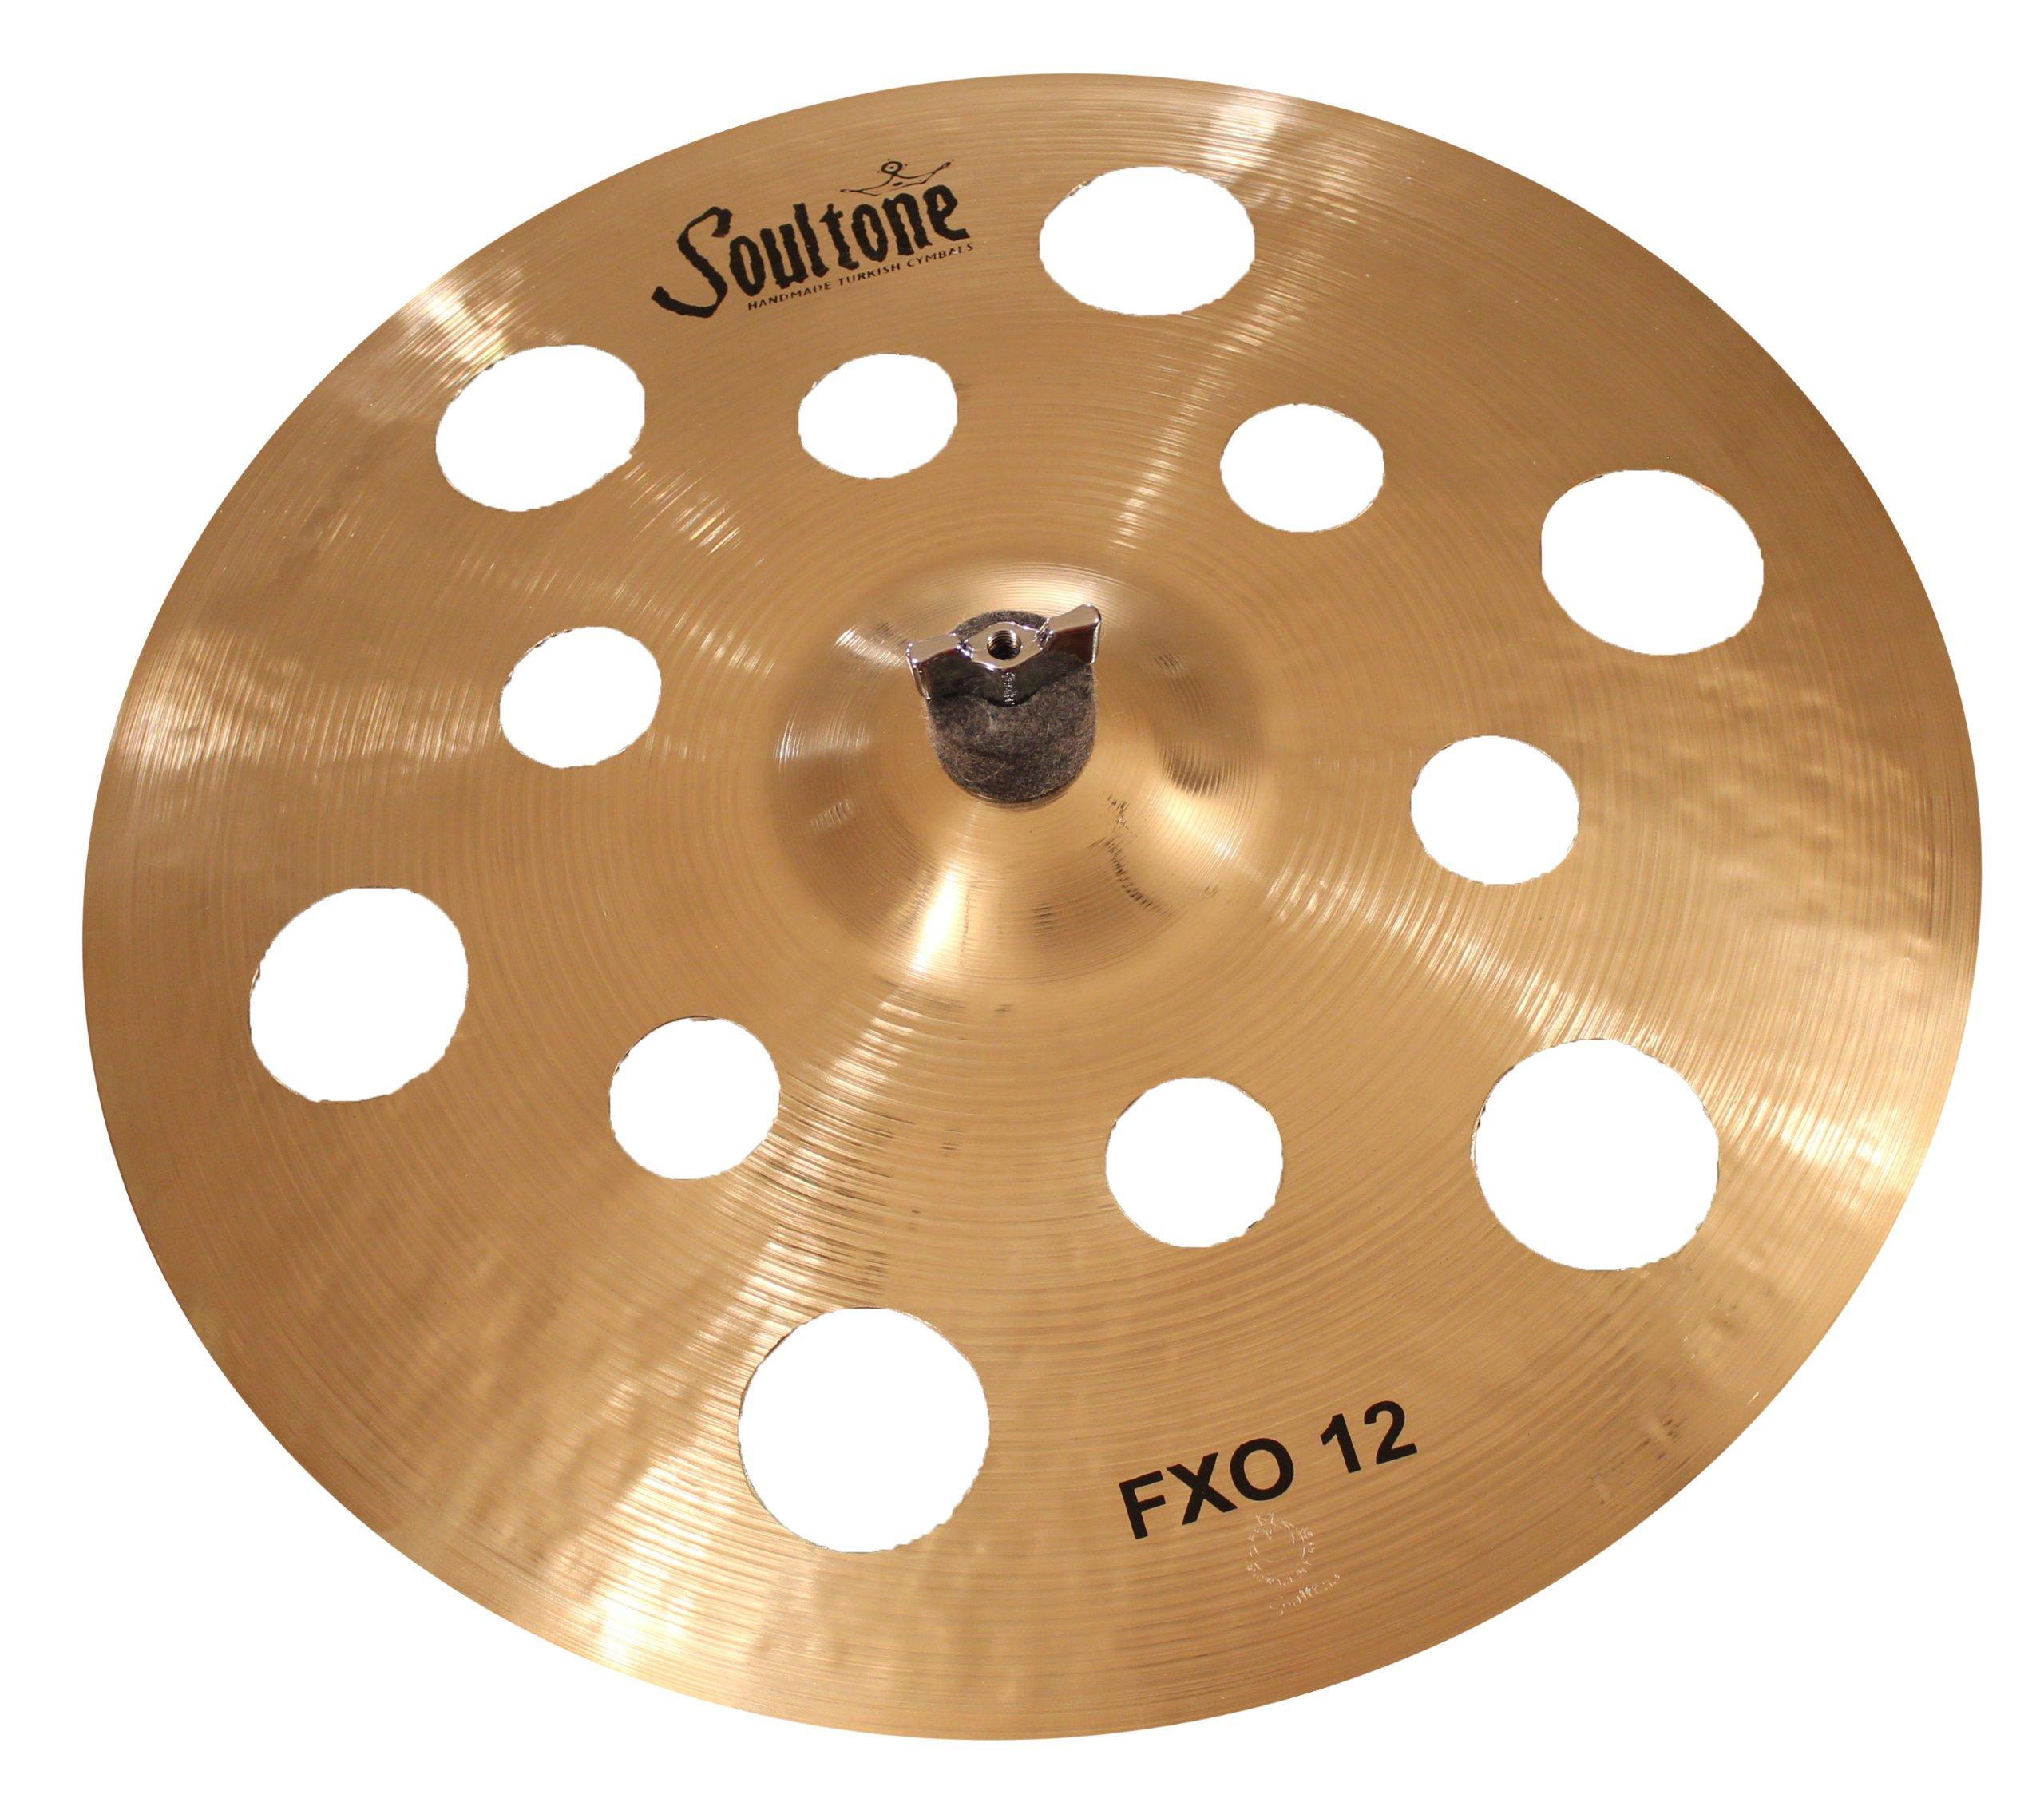 Soultone Cymbals F12-FXO22-22'' FXO 12 Crash by Soultone Cymbals